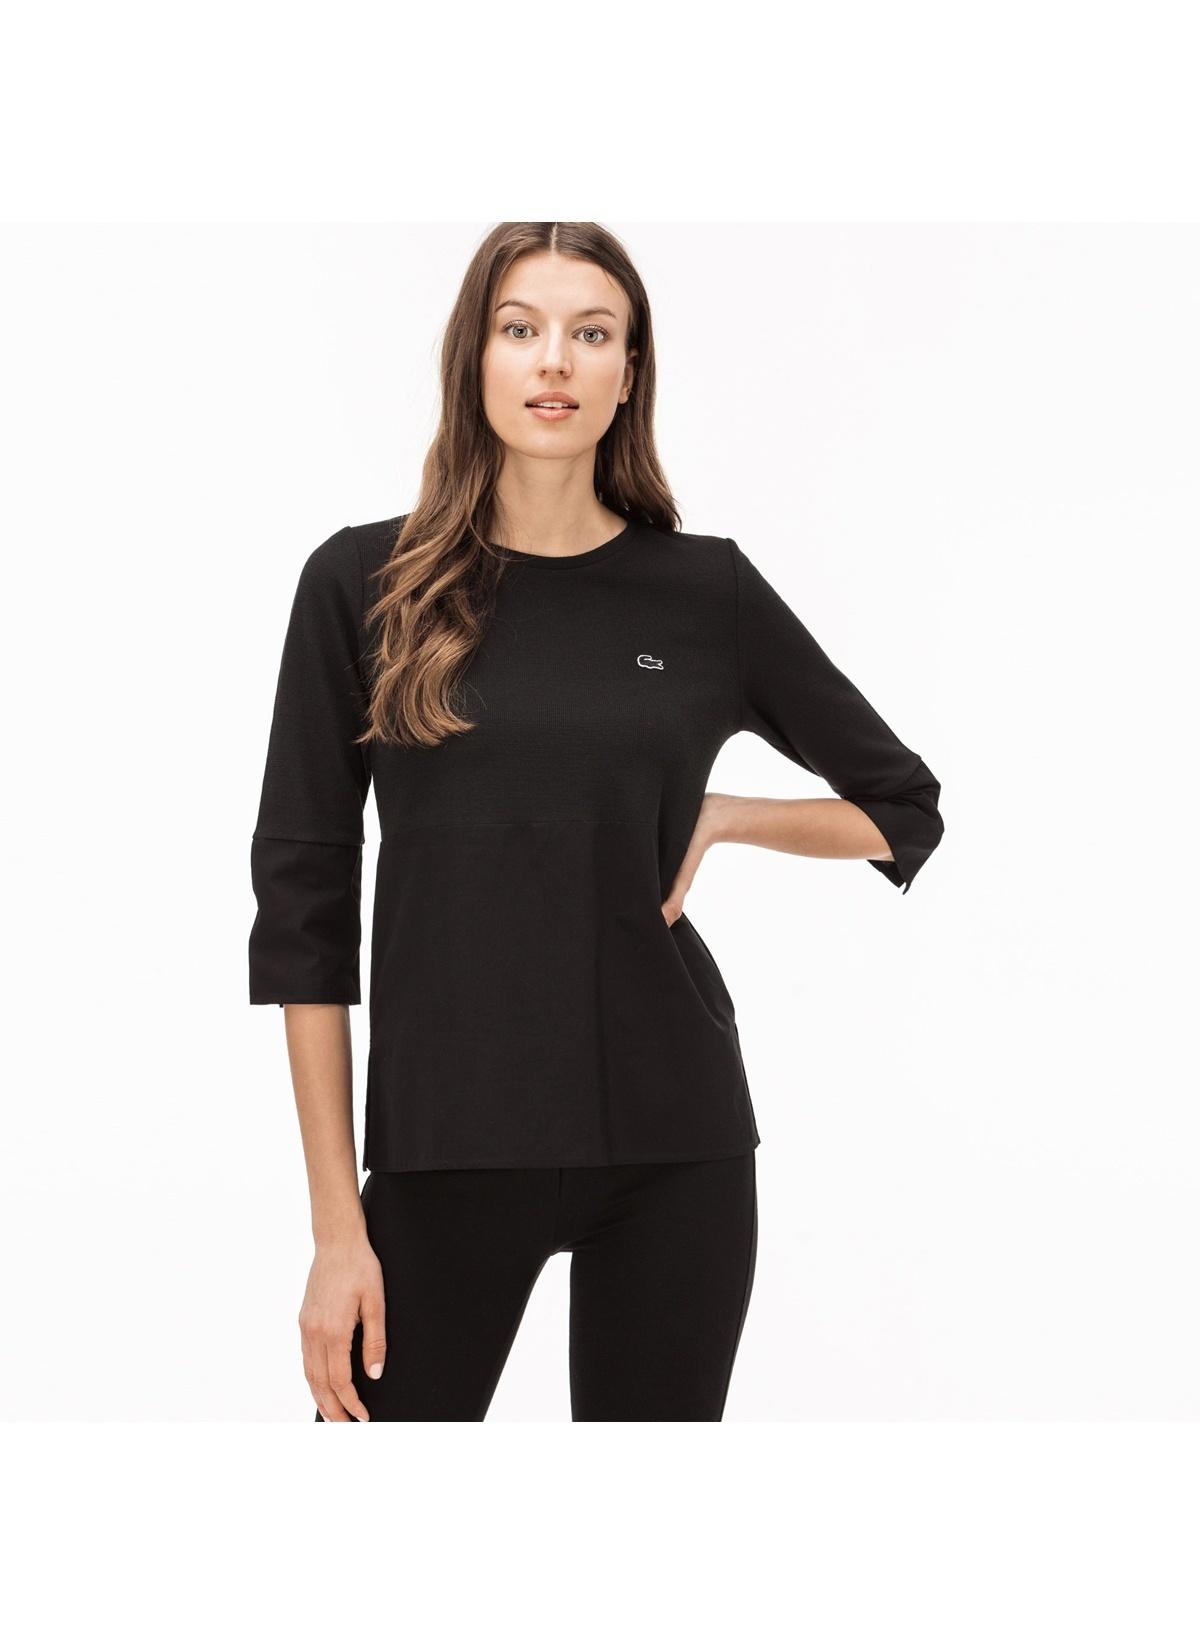 Lacoste Tişört Tf1901.01s T-shirt – 292.0 TL